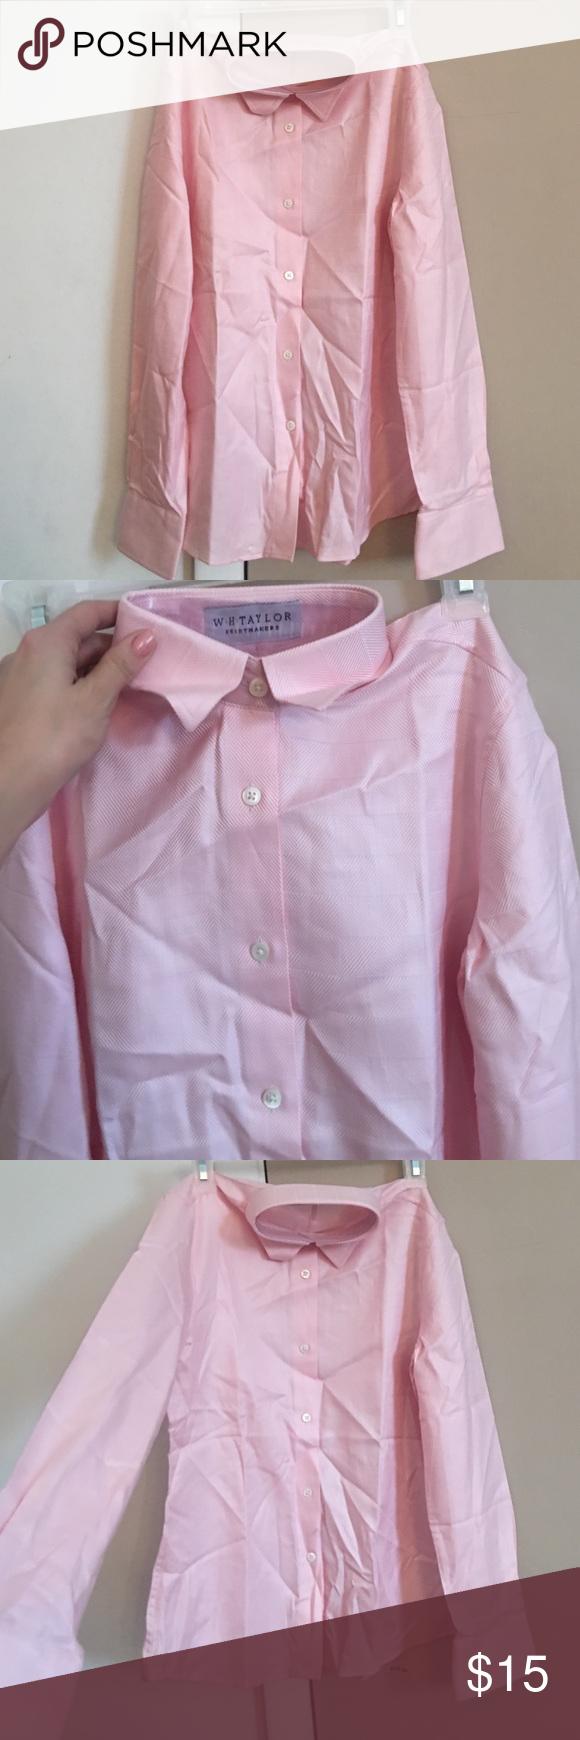 Mens Slim Fit Light Pink Dress Shirt